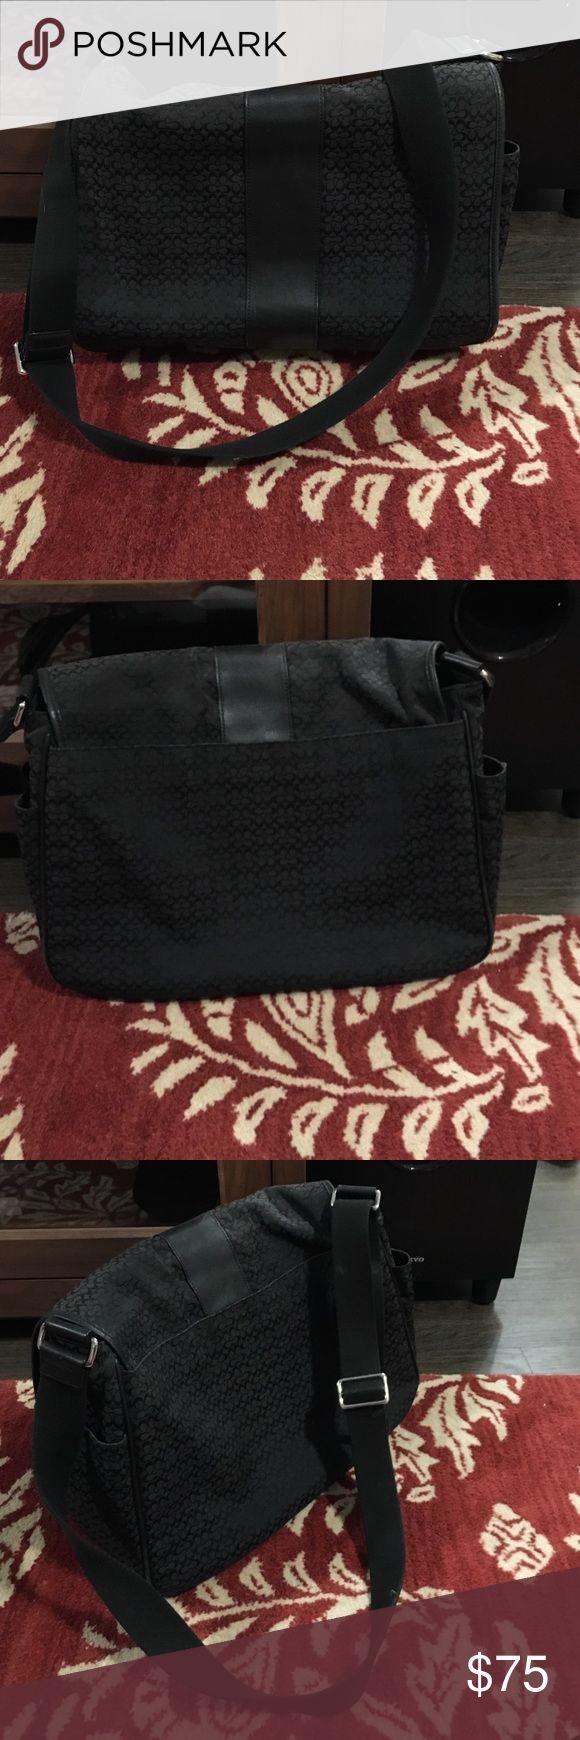 Coach Messenger Bag Black Coach messenger bag. Great as a laptop carrier! Coach Bags Laptop Bags